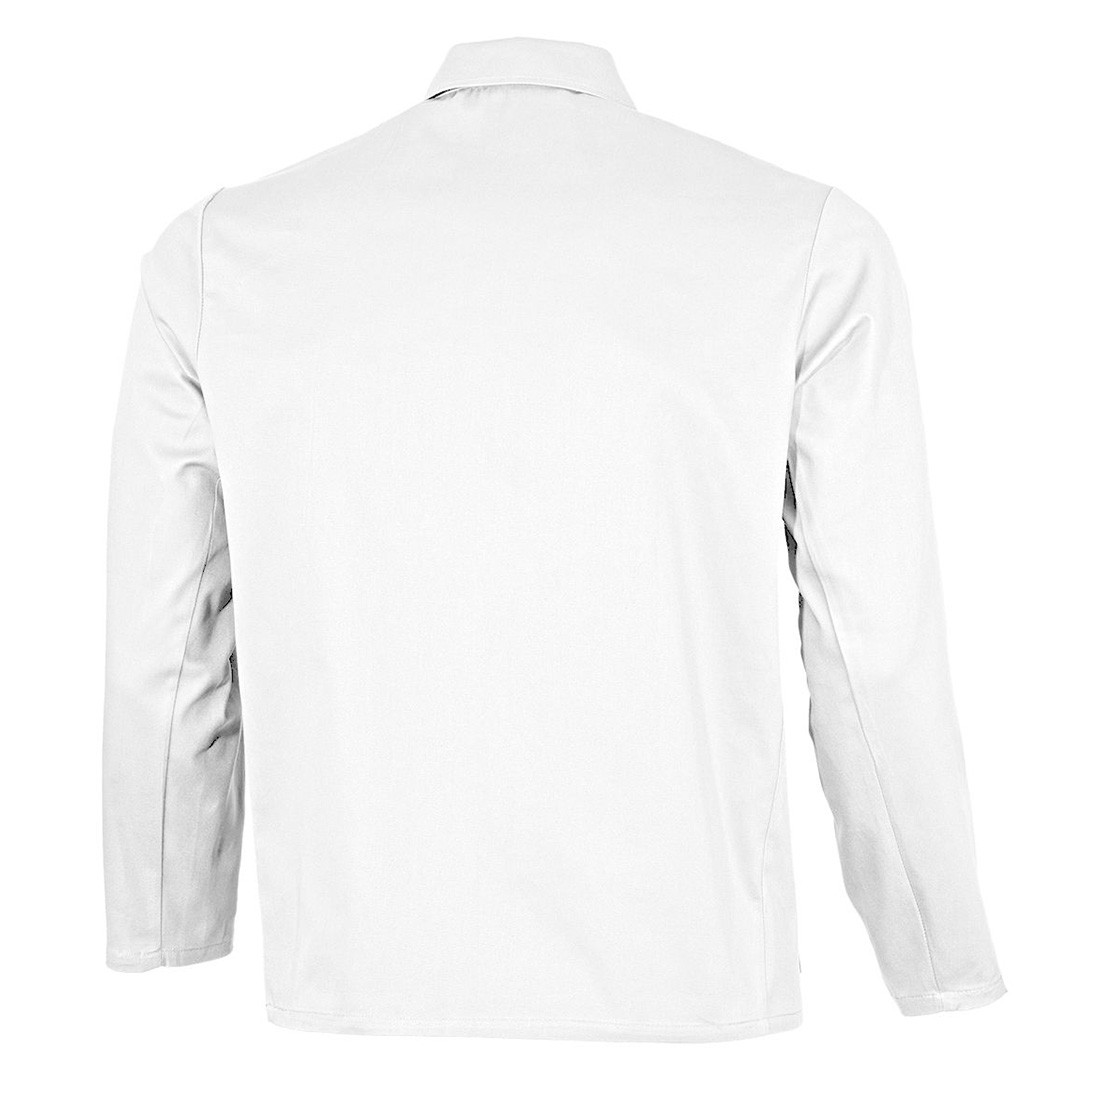 Jacheta de lucru - Imbracaminte de protectie